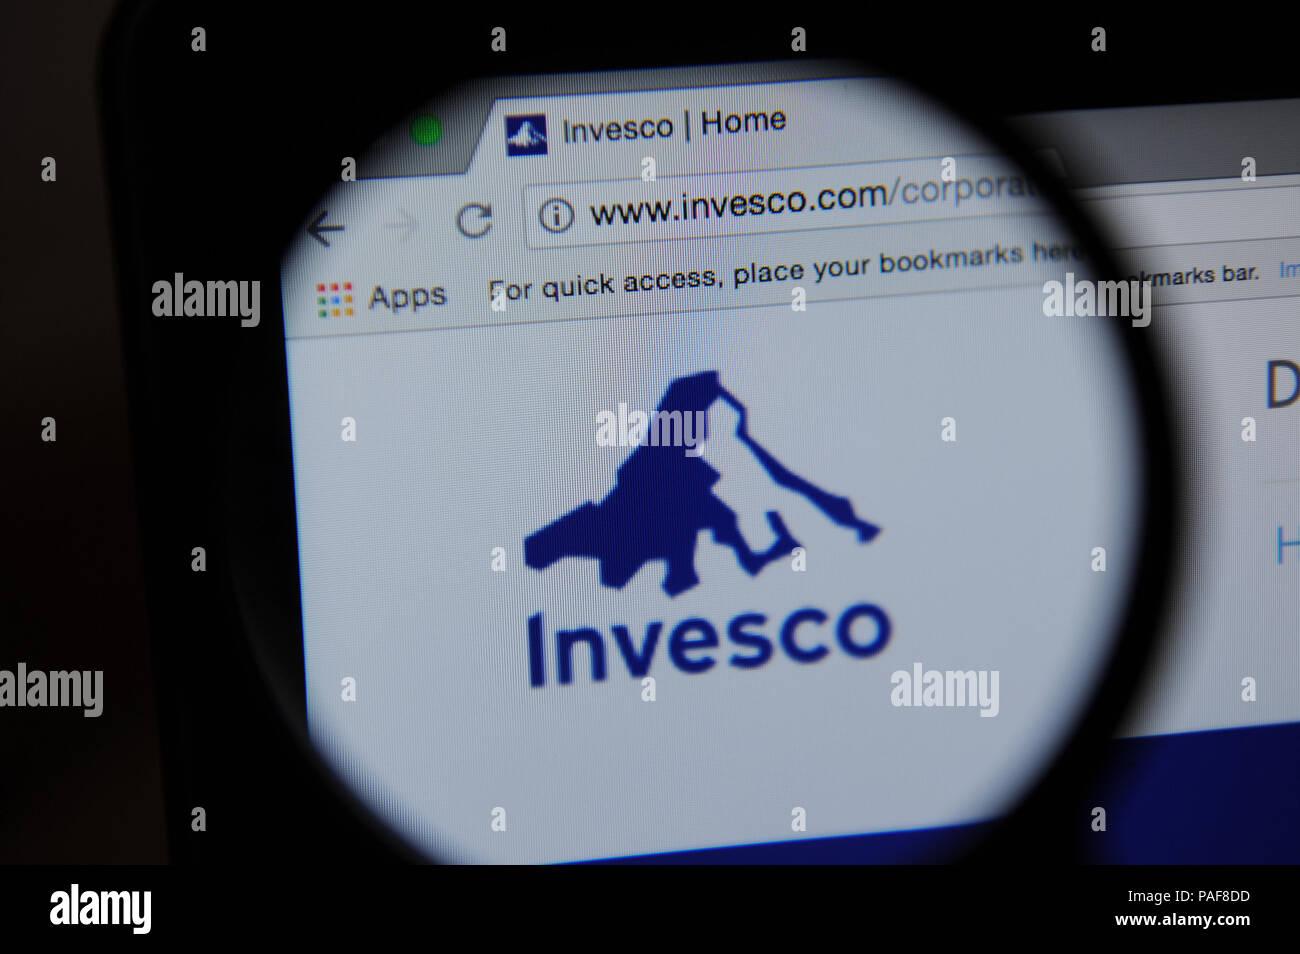 The Invesco Website Seen Through A Magnifying Glass Stock Photo